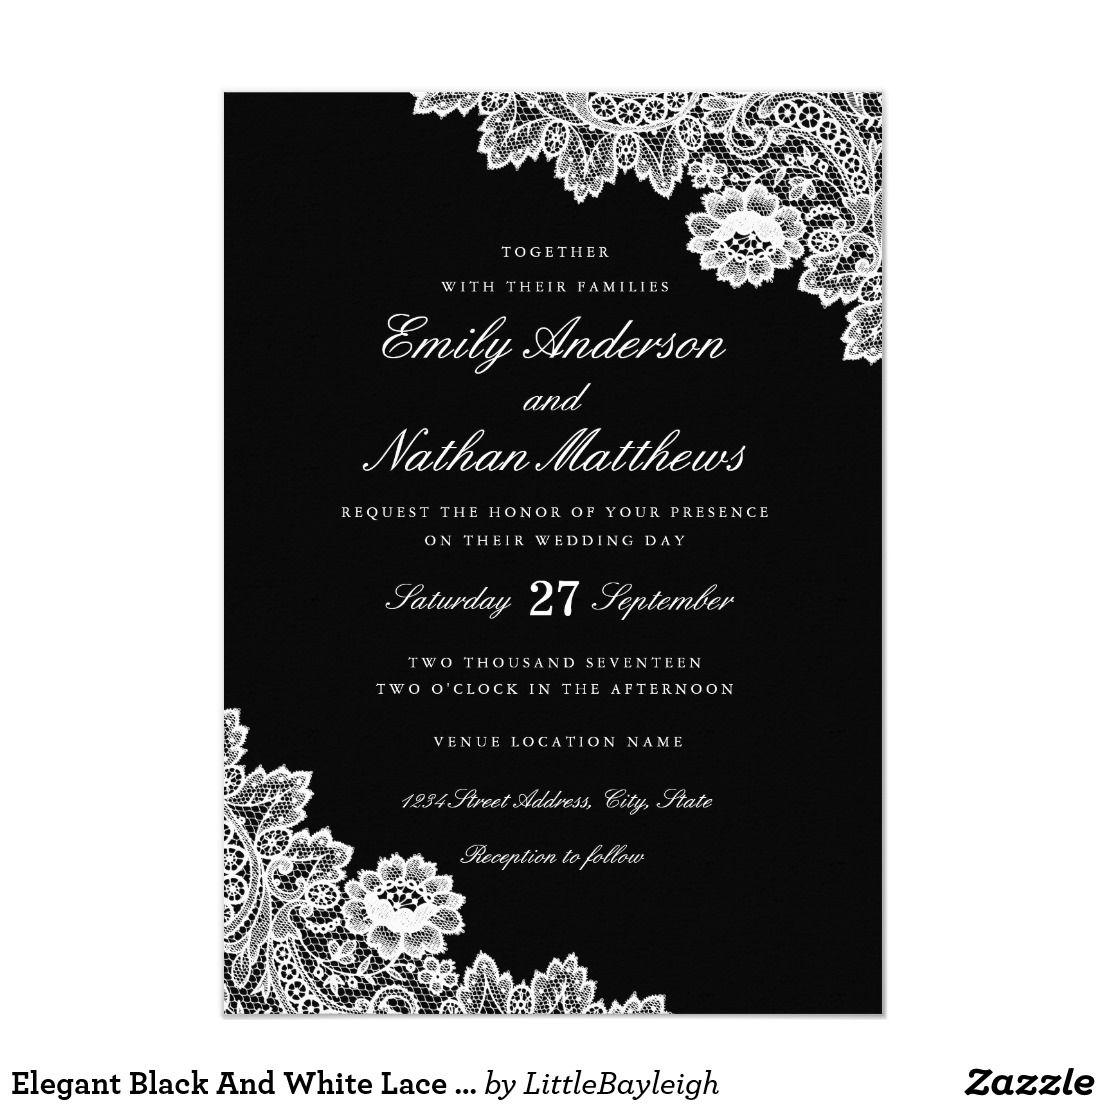 Elegant Black And White Lace Wedding Invitation Zazzle Com